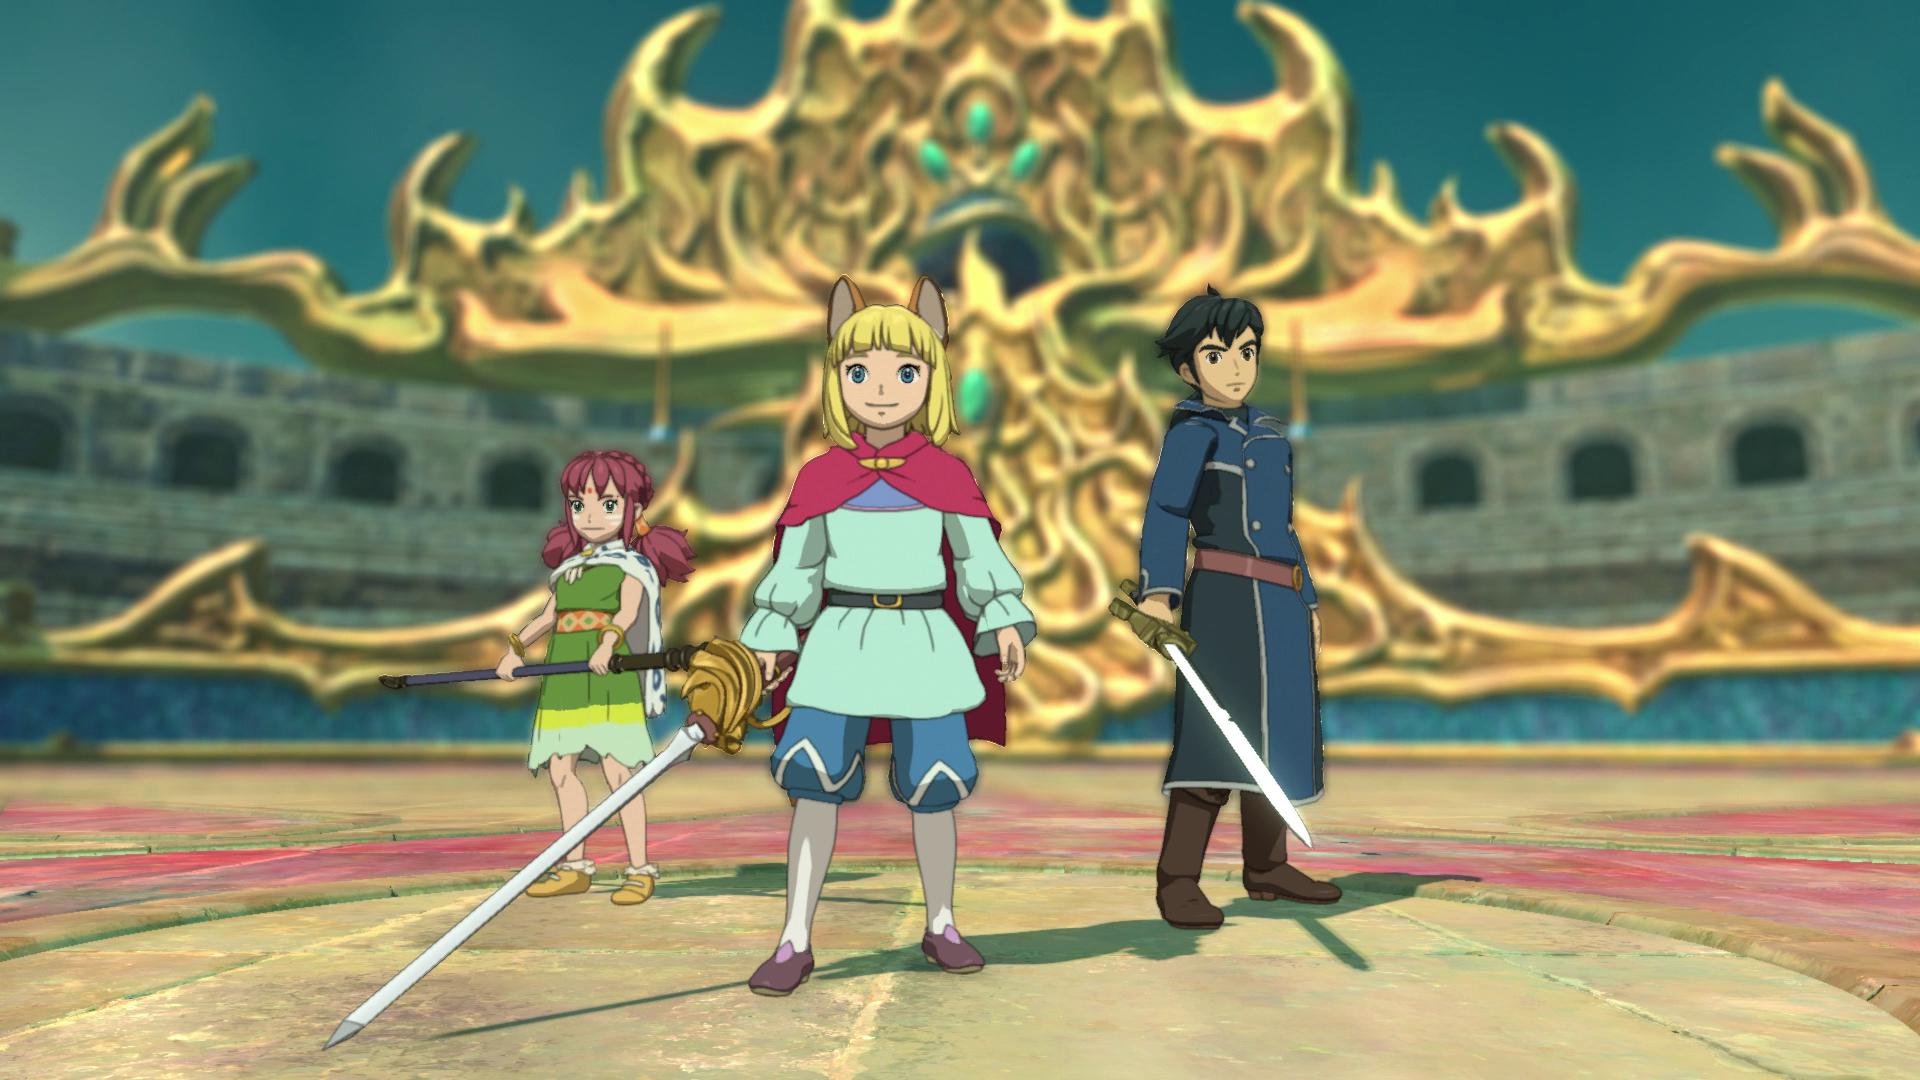 The new Ni No Kuni isn't technically a Studio Ghibli game, but it